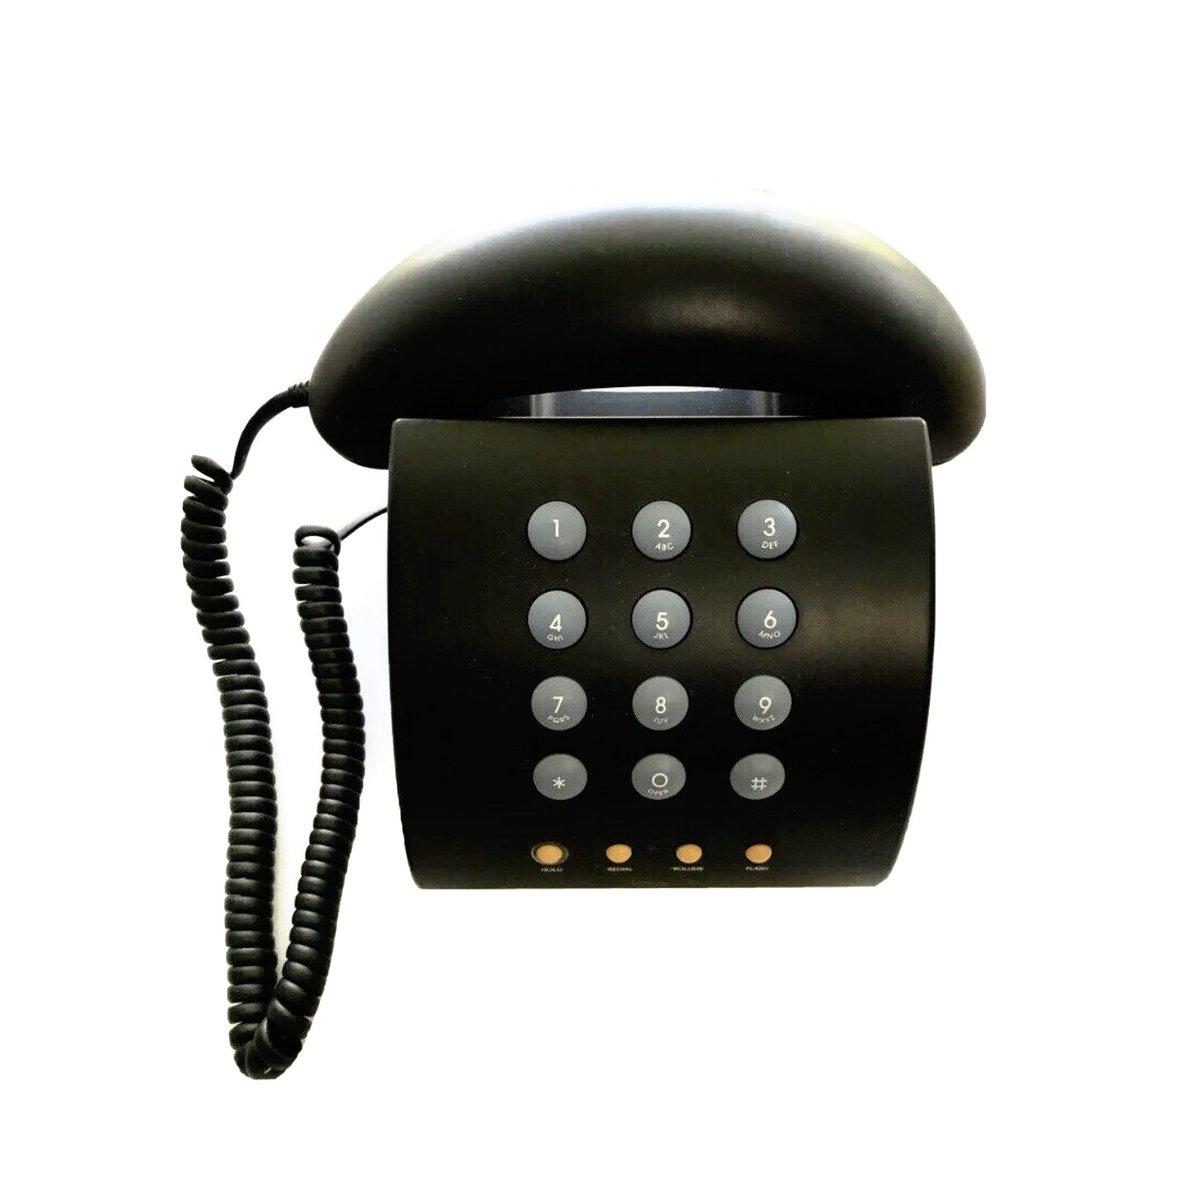 Black #MichaelGraves MG1000 phone up on the site soon  #vintage #vintagephone #90sbabies #interiordesign #interiorstyle #modernism #postmodern #1990s⠀ #modernism #postmodern #postmoderndesign #postmodernism #interior #decor  #classic#timeless#design #vintage#vintageshop